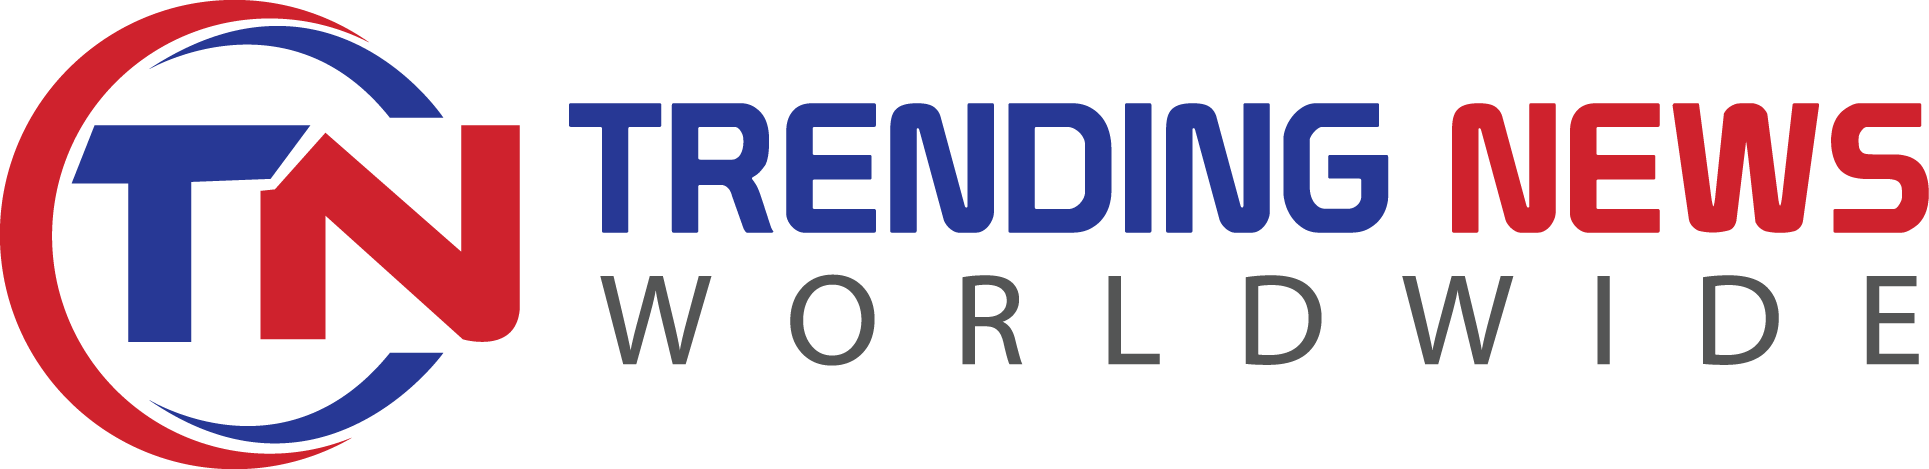 Trending News Worldwide